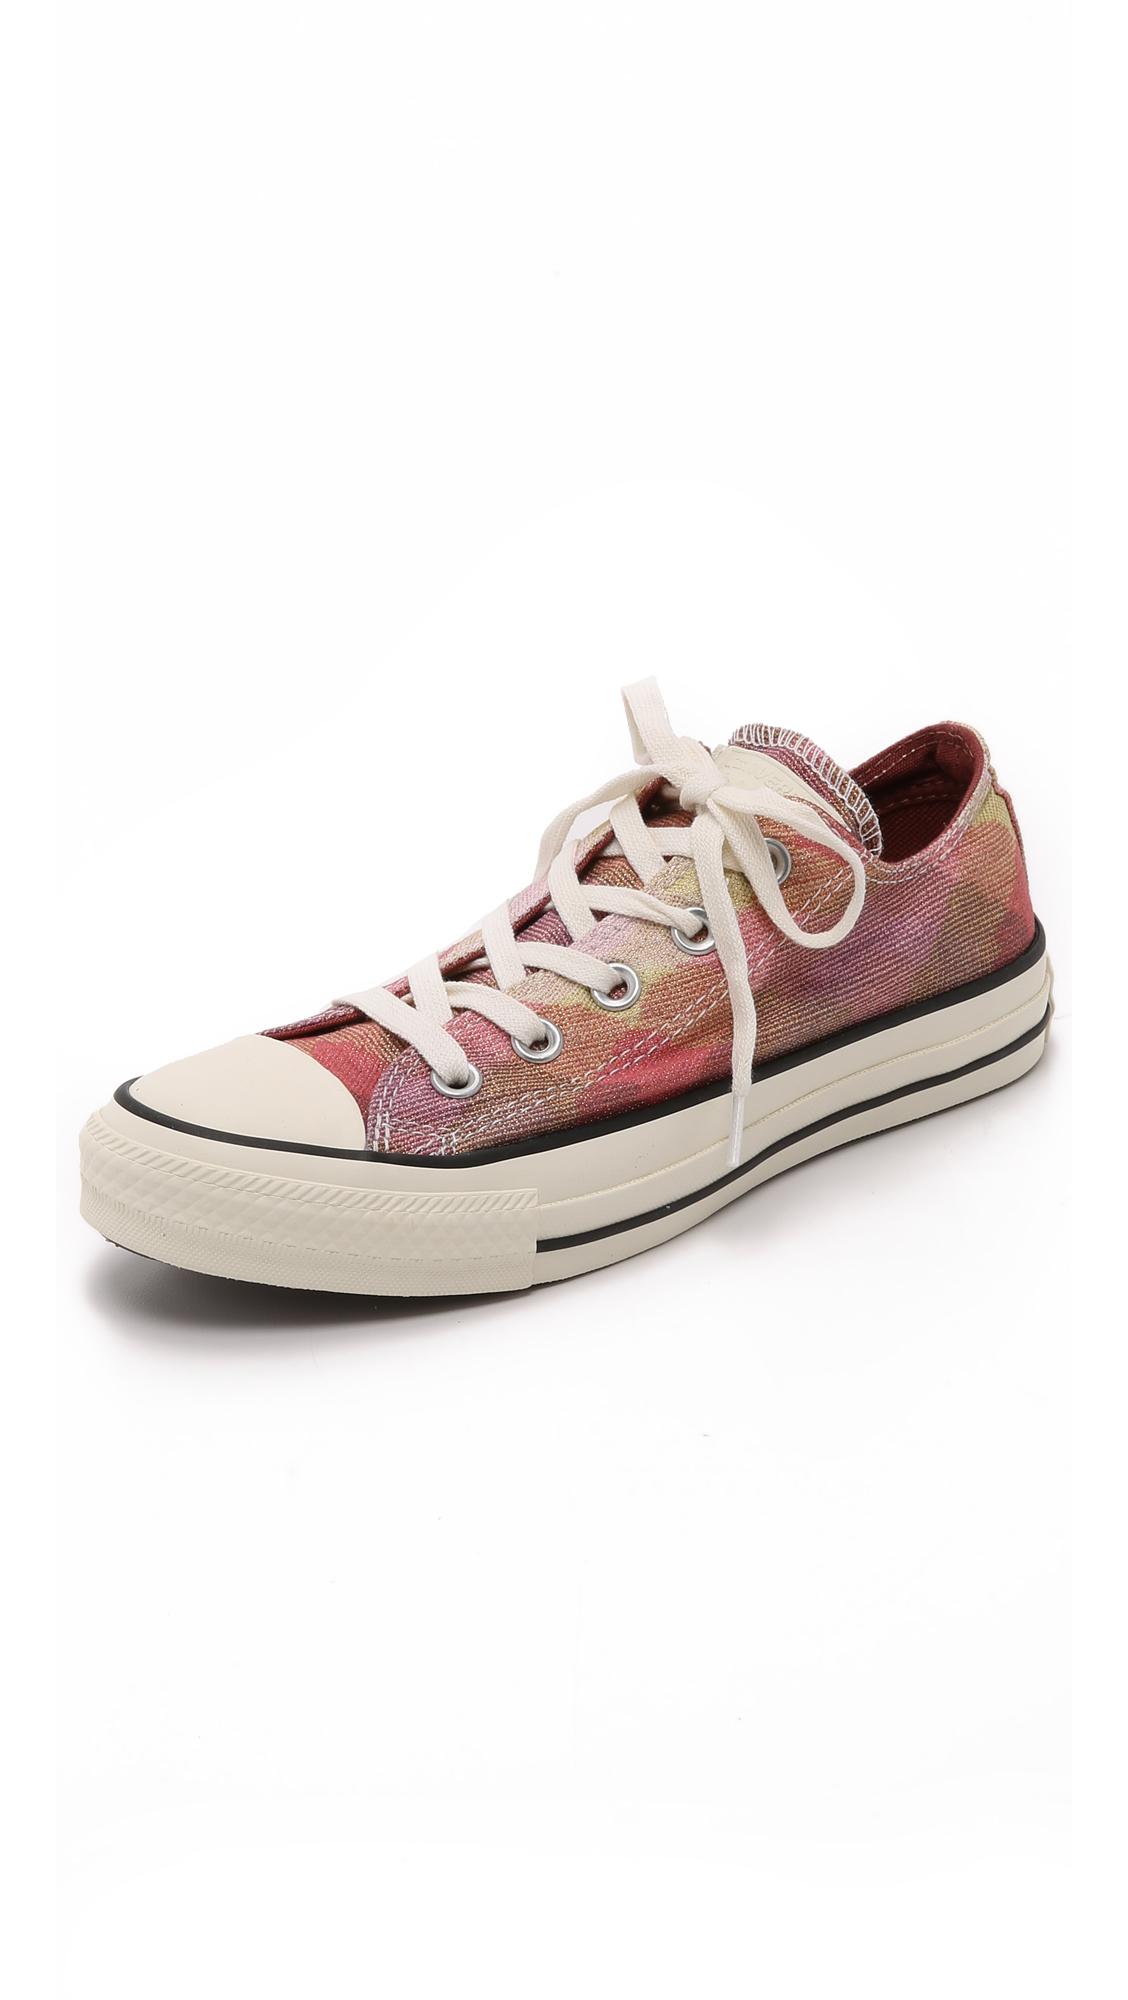 Women-Converse Ct As Ox Missoni Sneakers Pink/Auburn/Egret